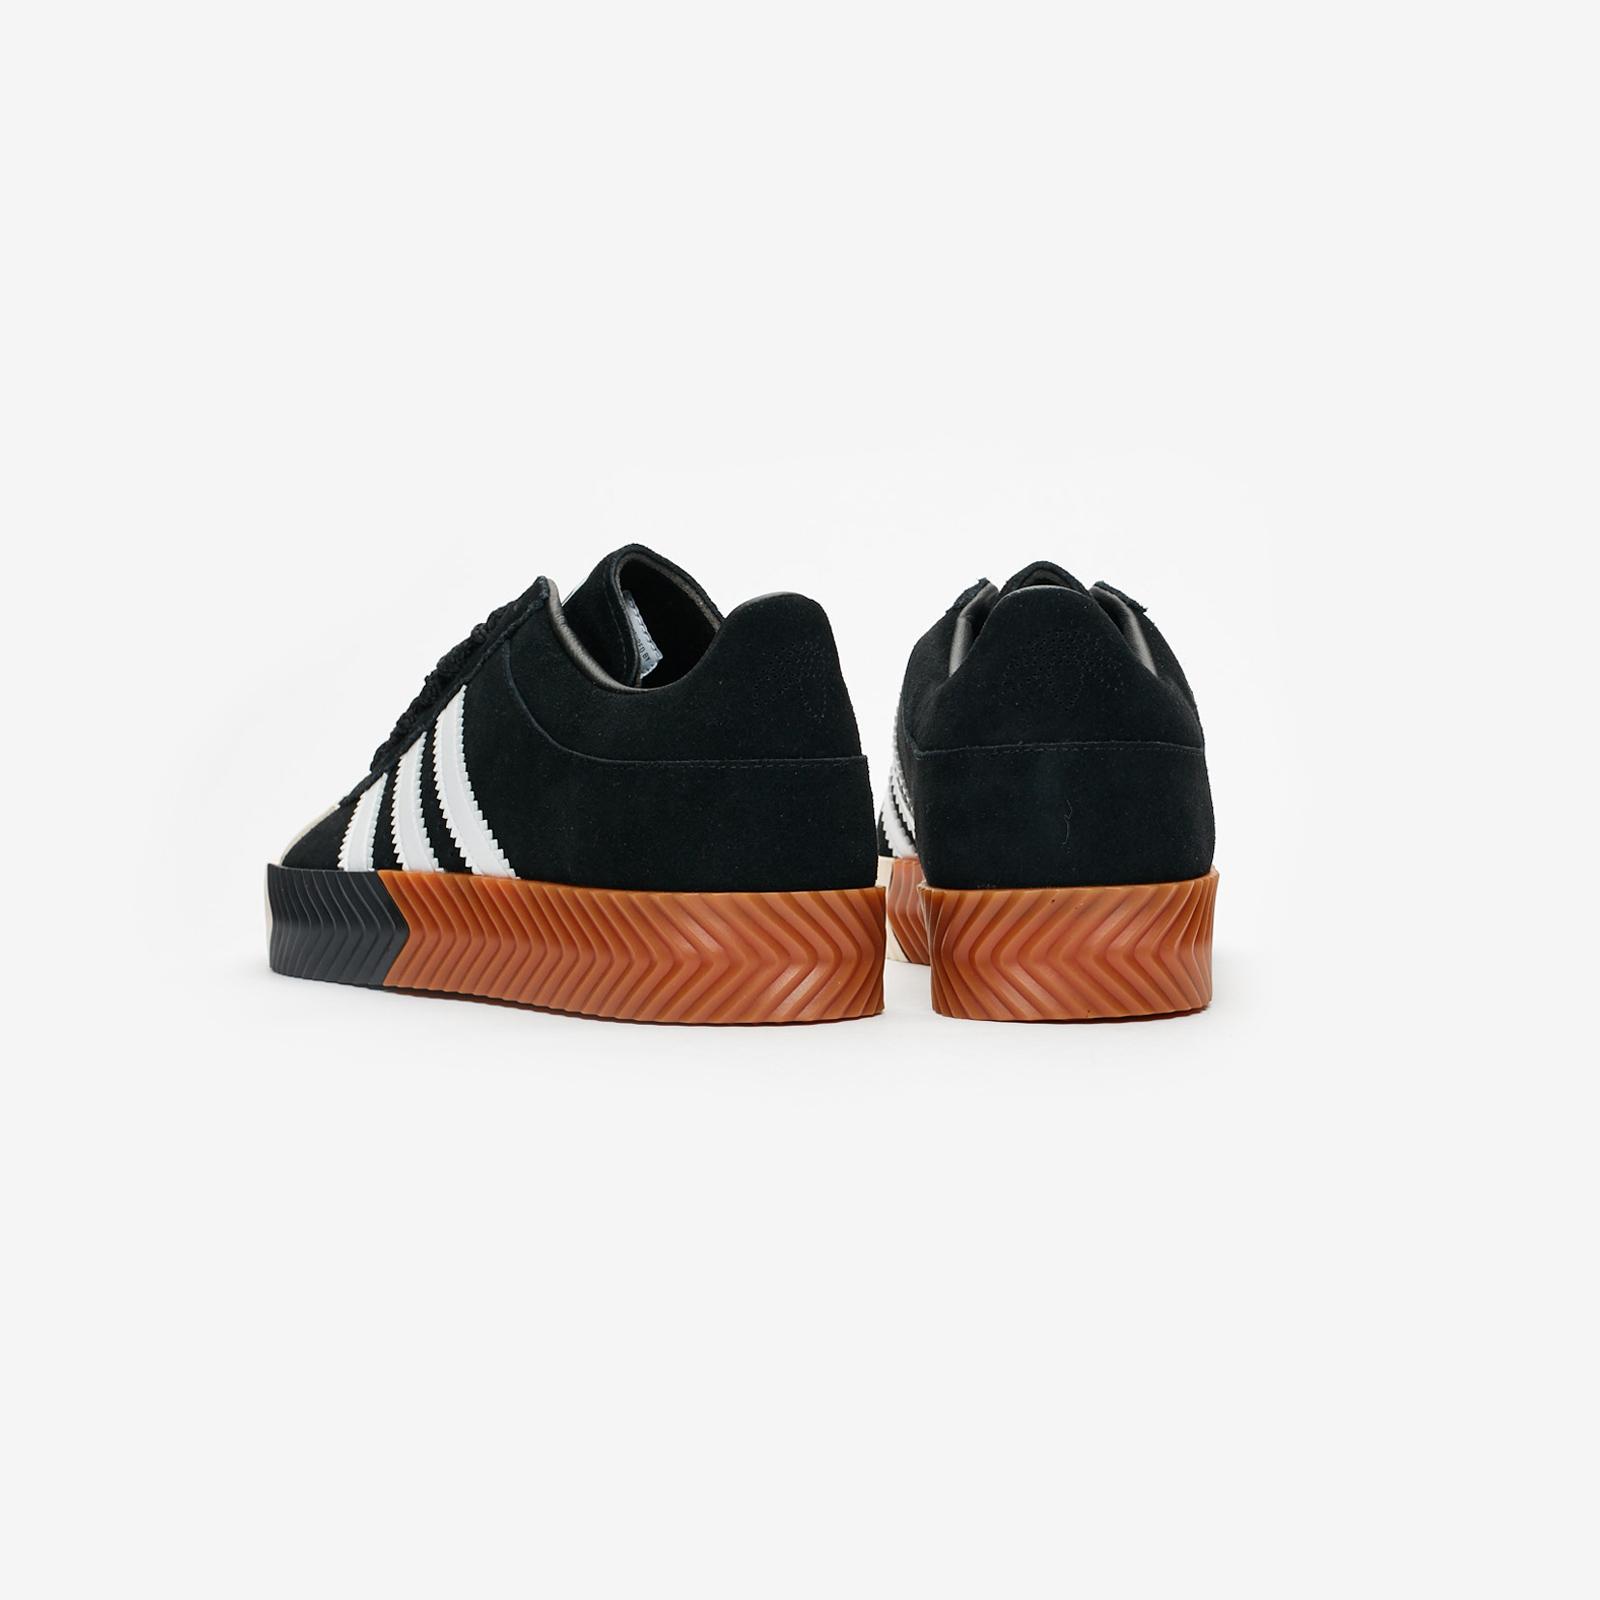 separation shoes feafe df0cc ... adidas Originals by Alexander Wang AW Skate Super ...